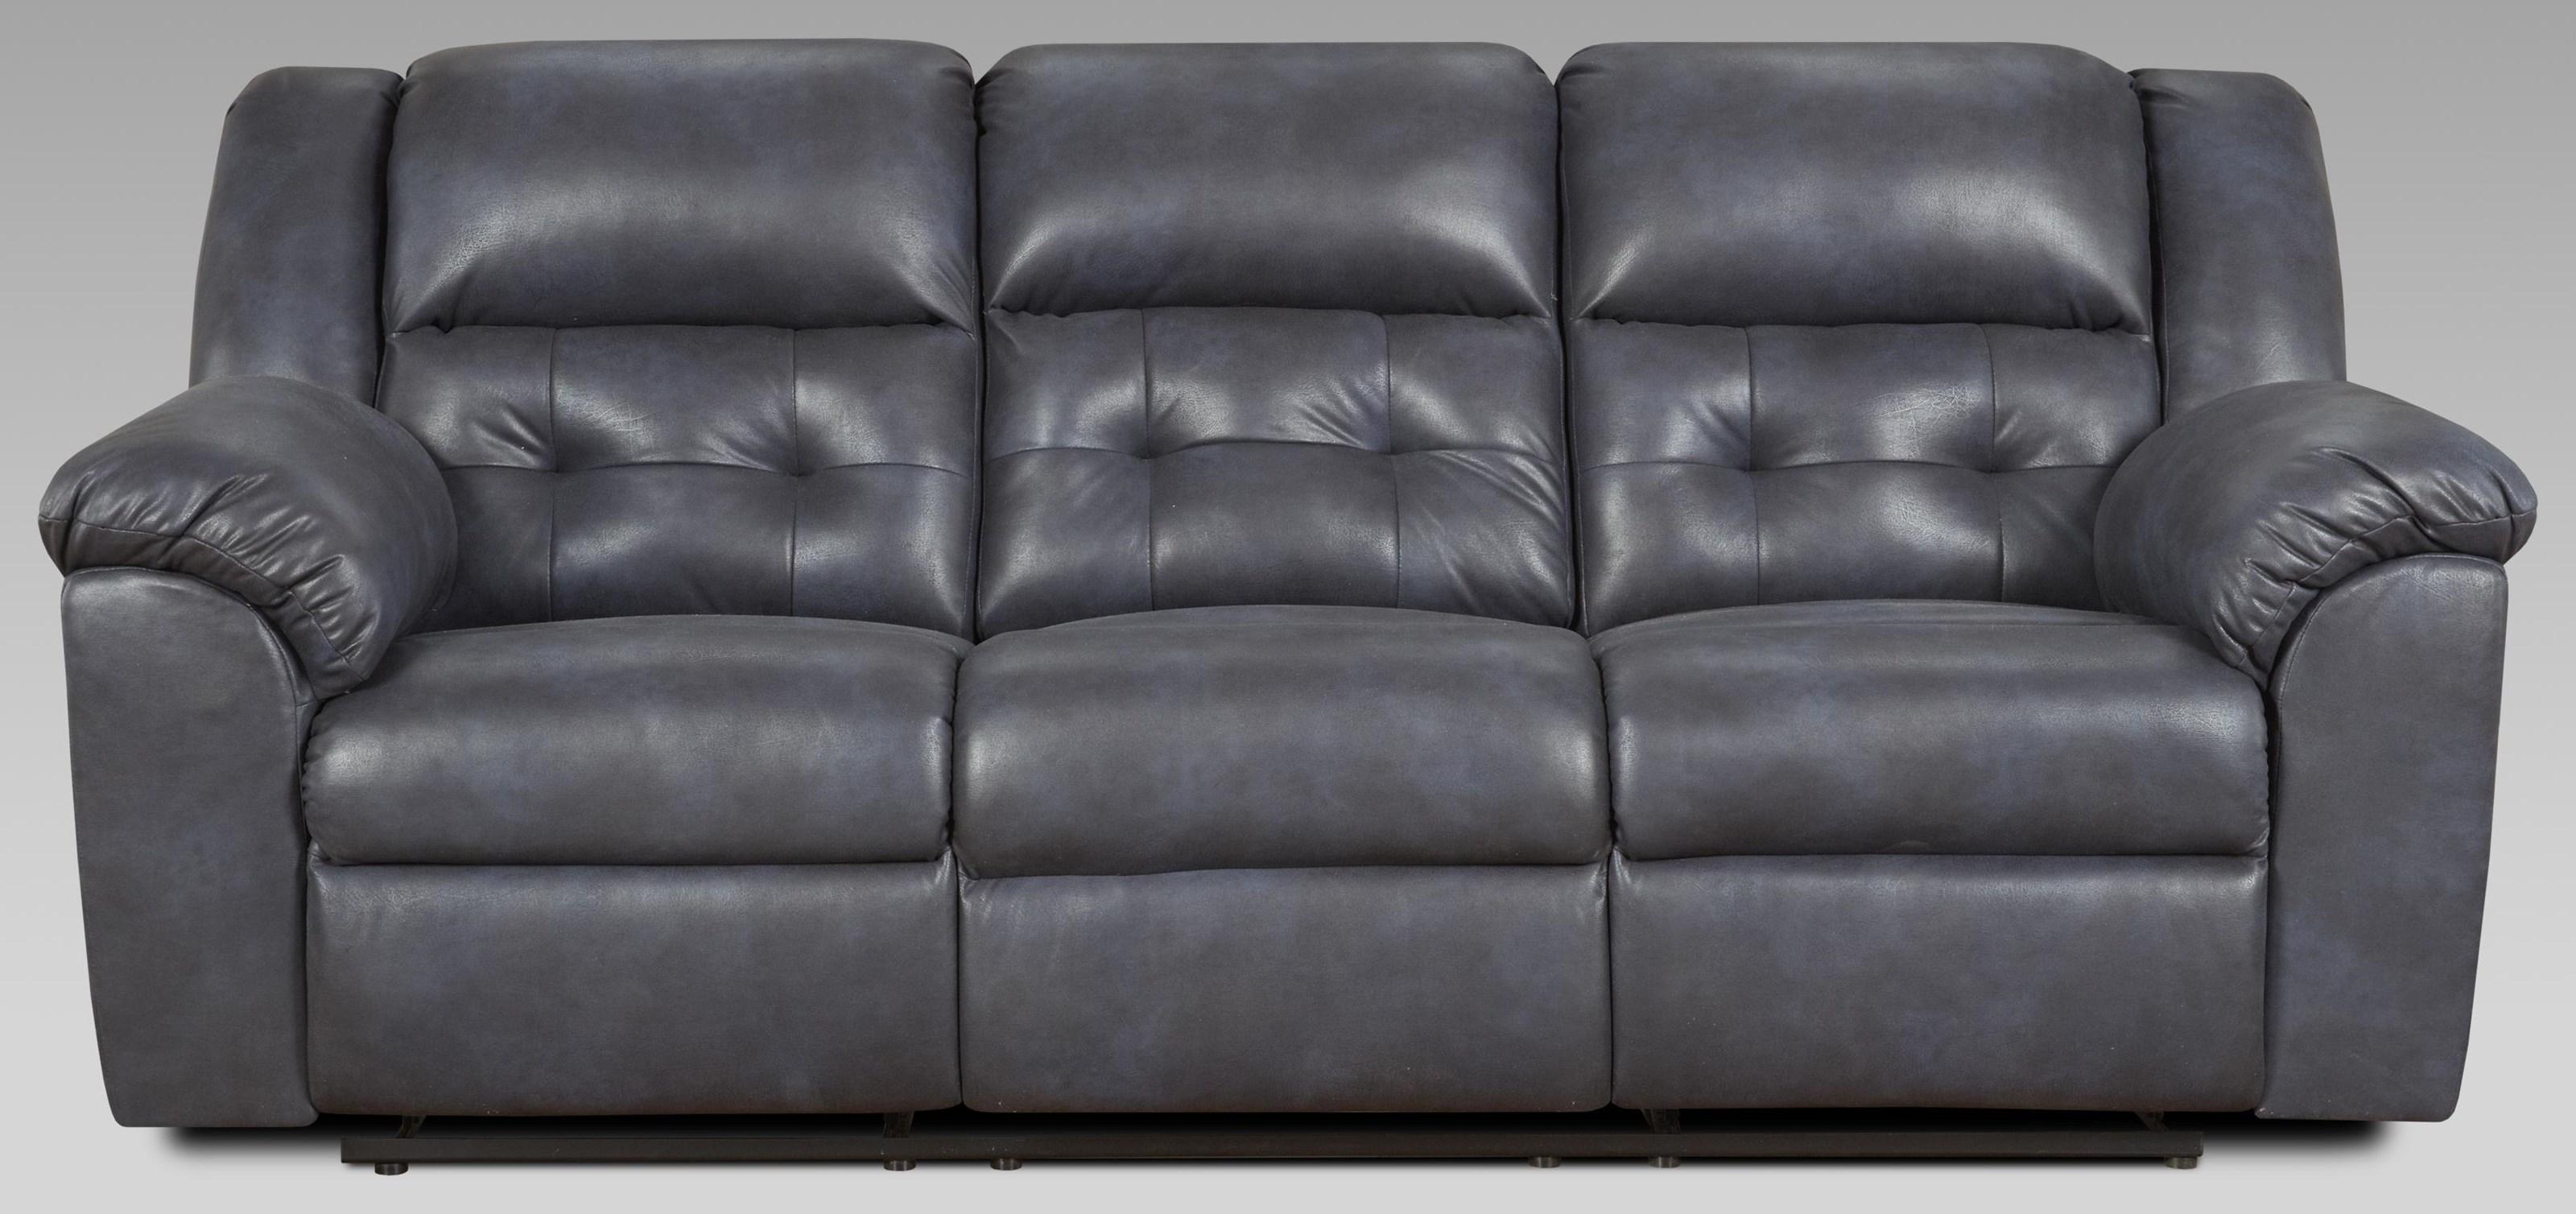 1500 Telluride Indigo Dual Reclining Power Sofa by Affordable Furniture at Furniture Fair - North Carolina